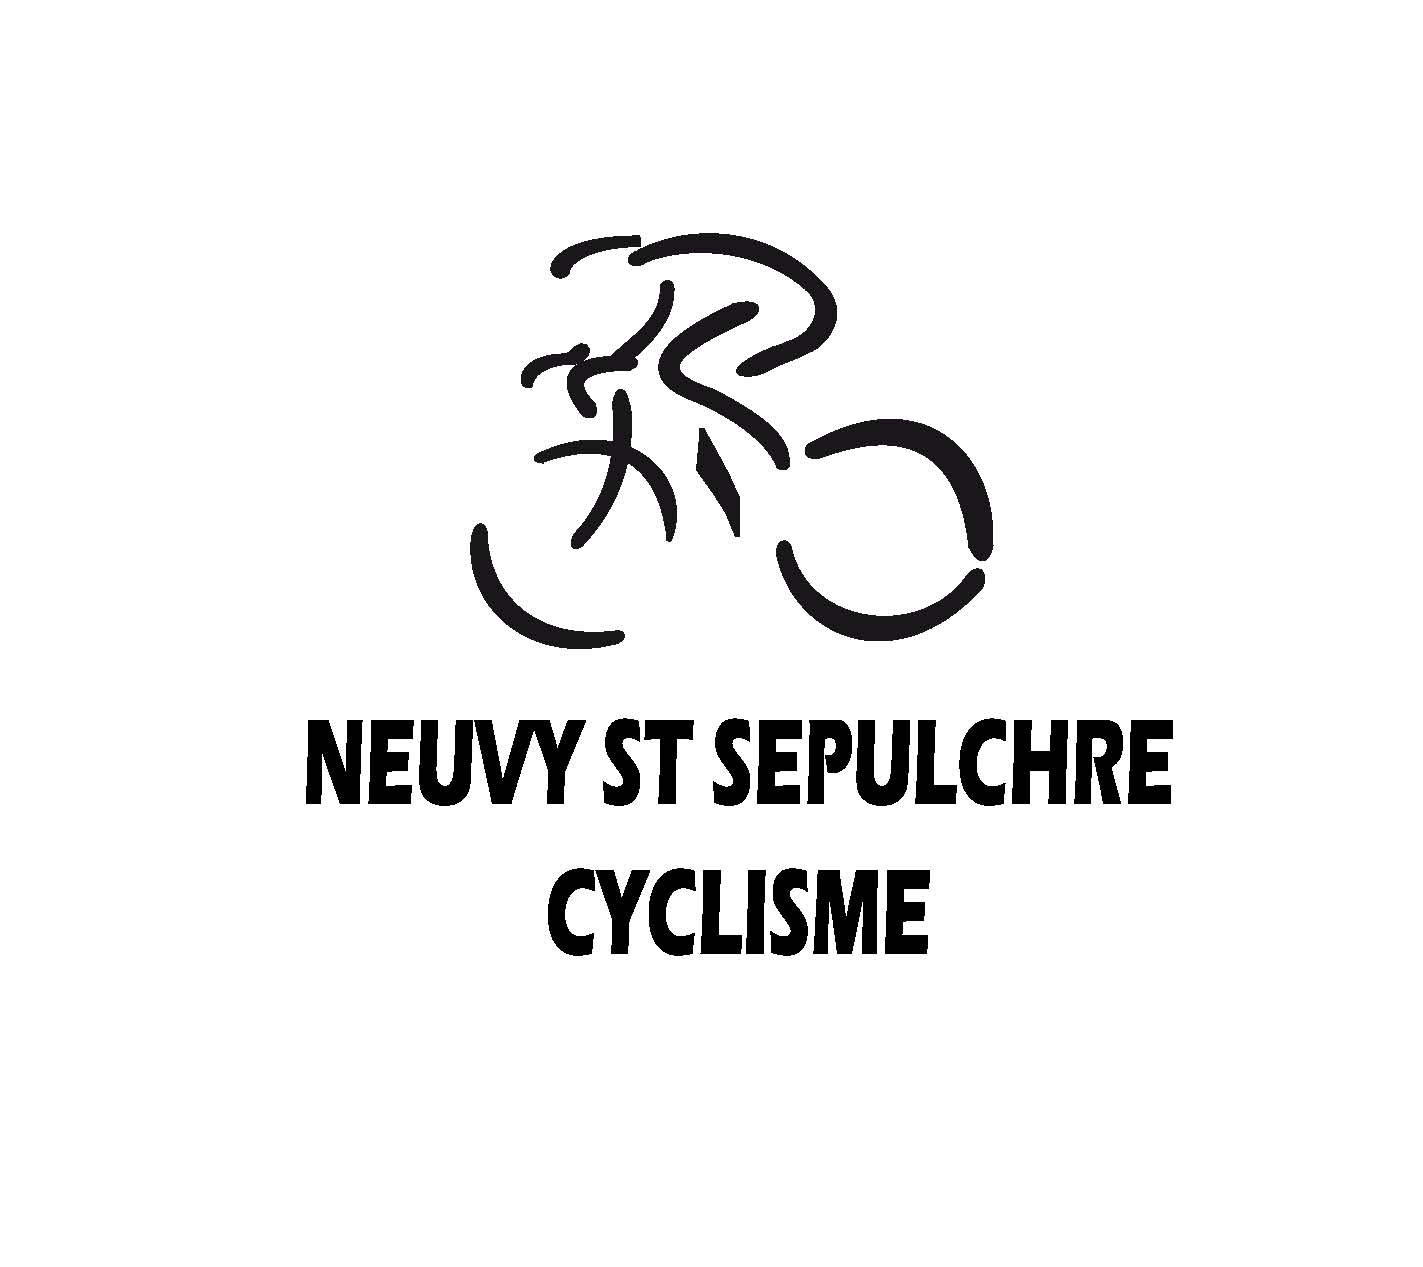 Neuvy cyclisme logo